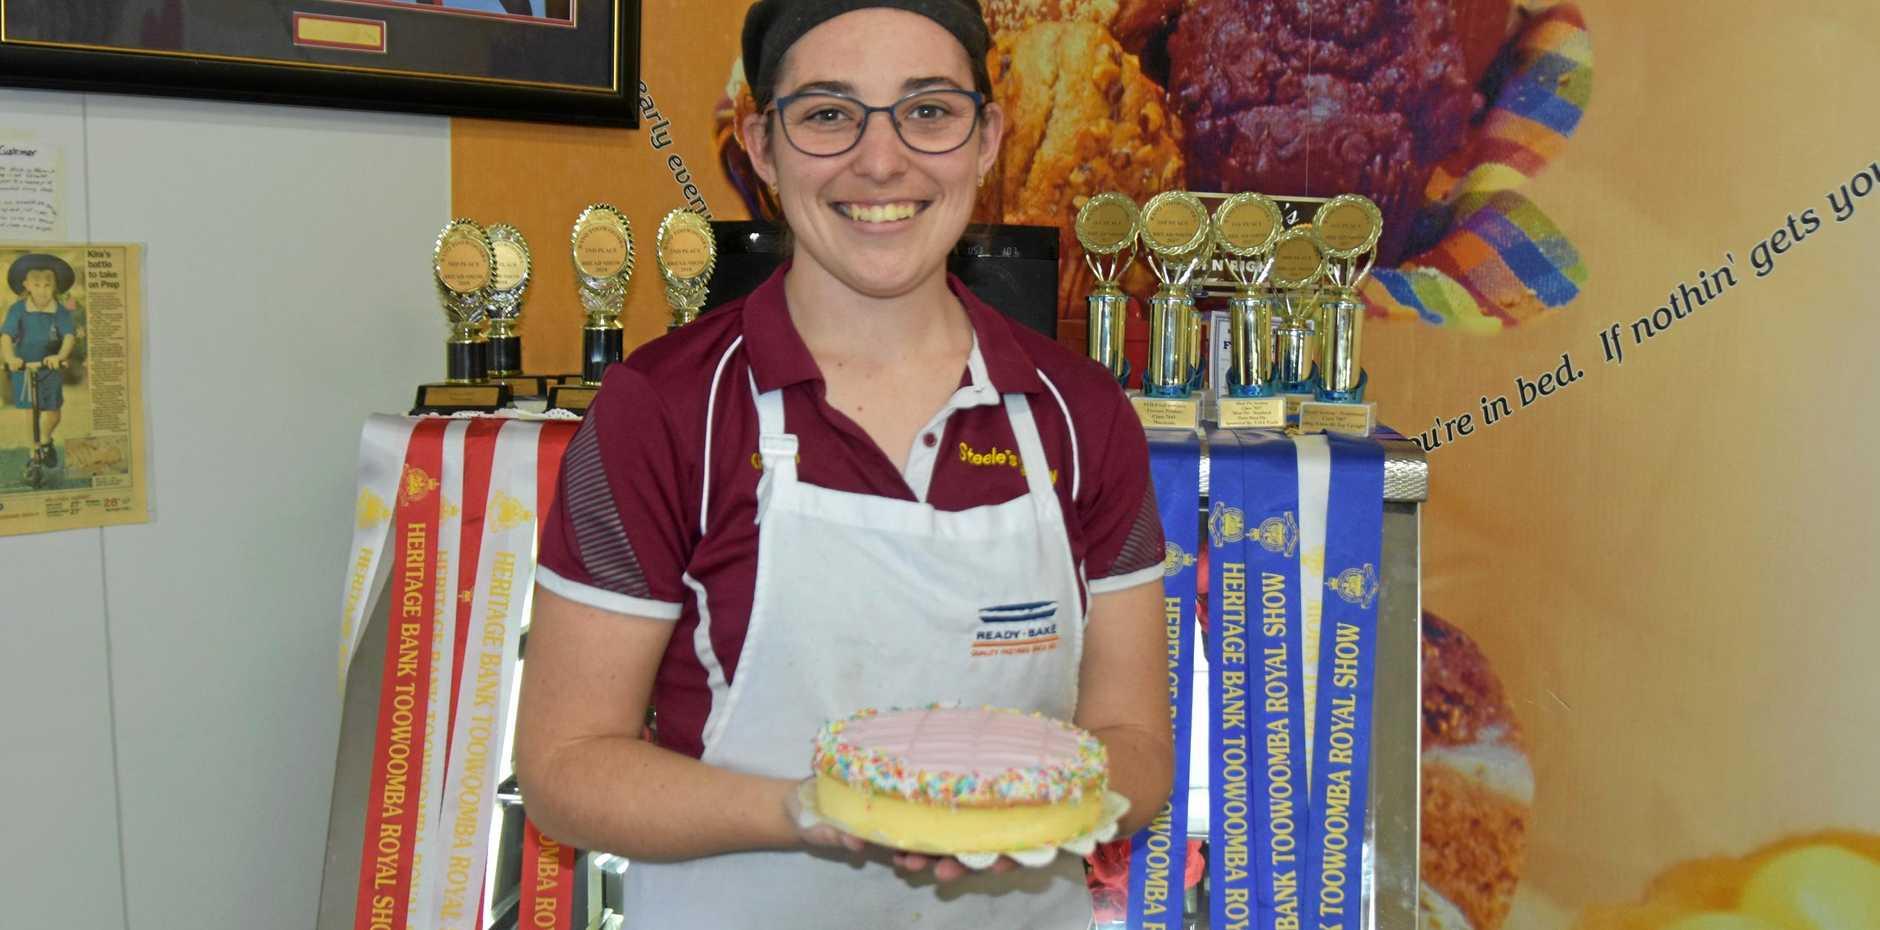 ICING ON TOP: Kirsten Eddiehausen's big honour as she's nominated top apprentice in Queensland.